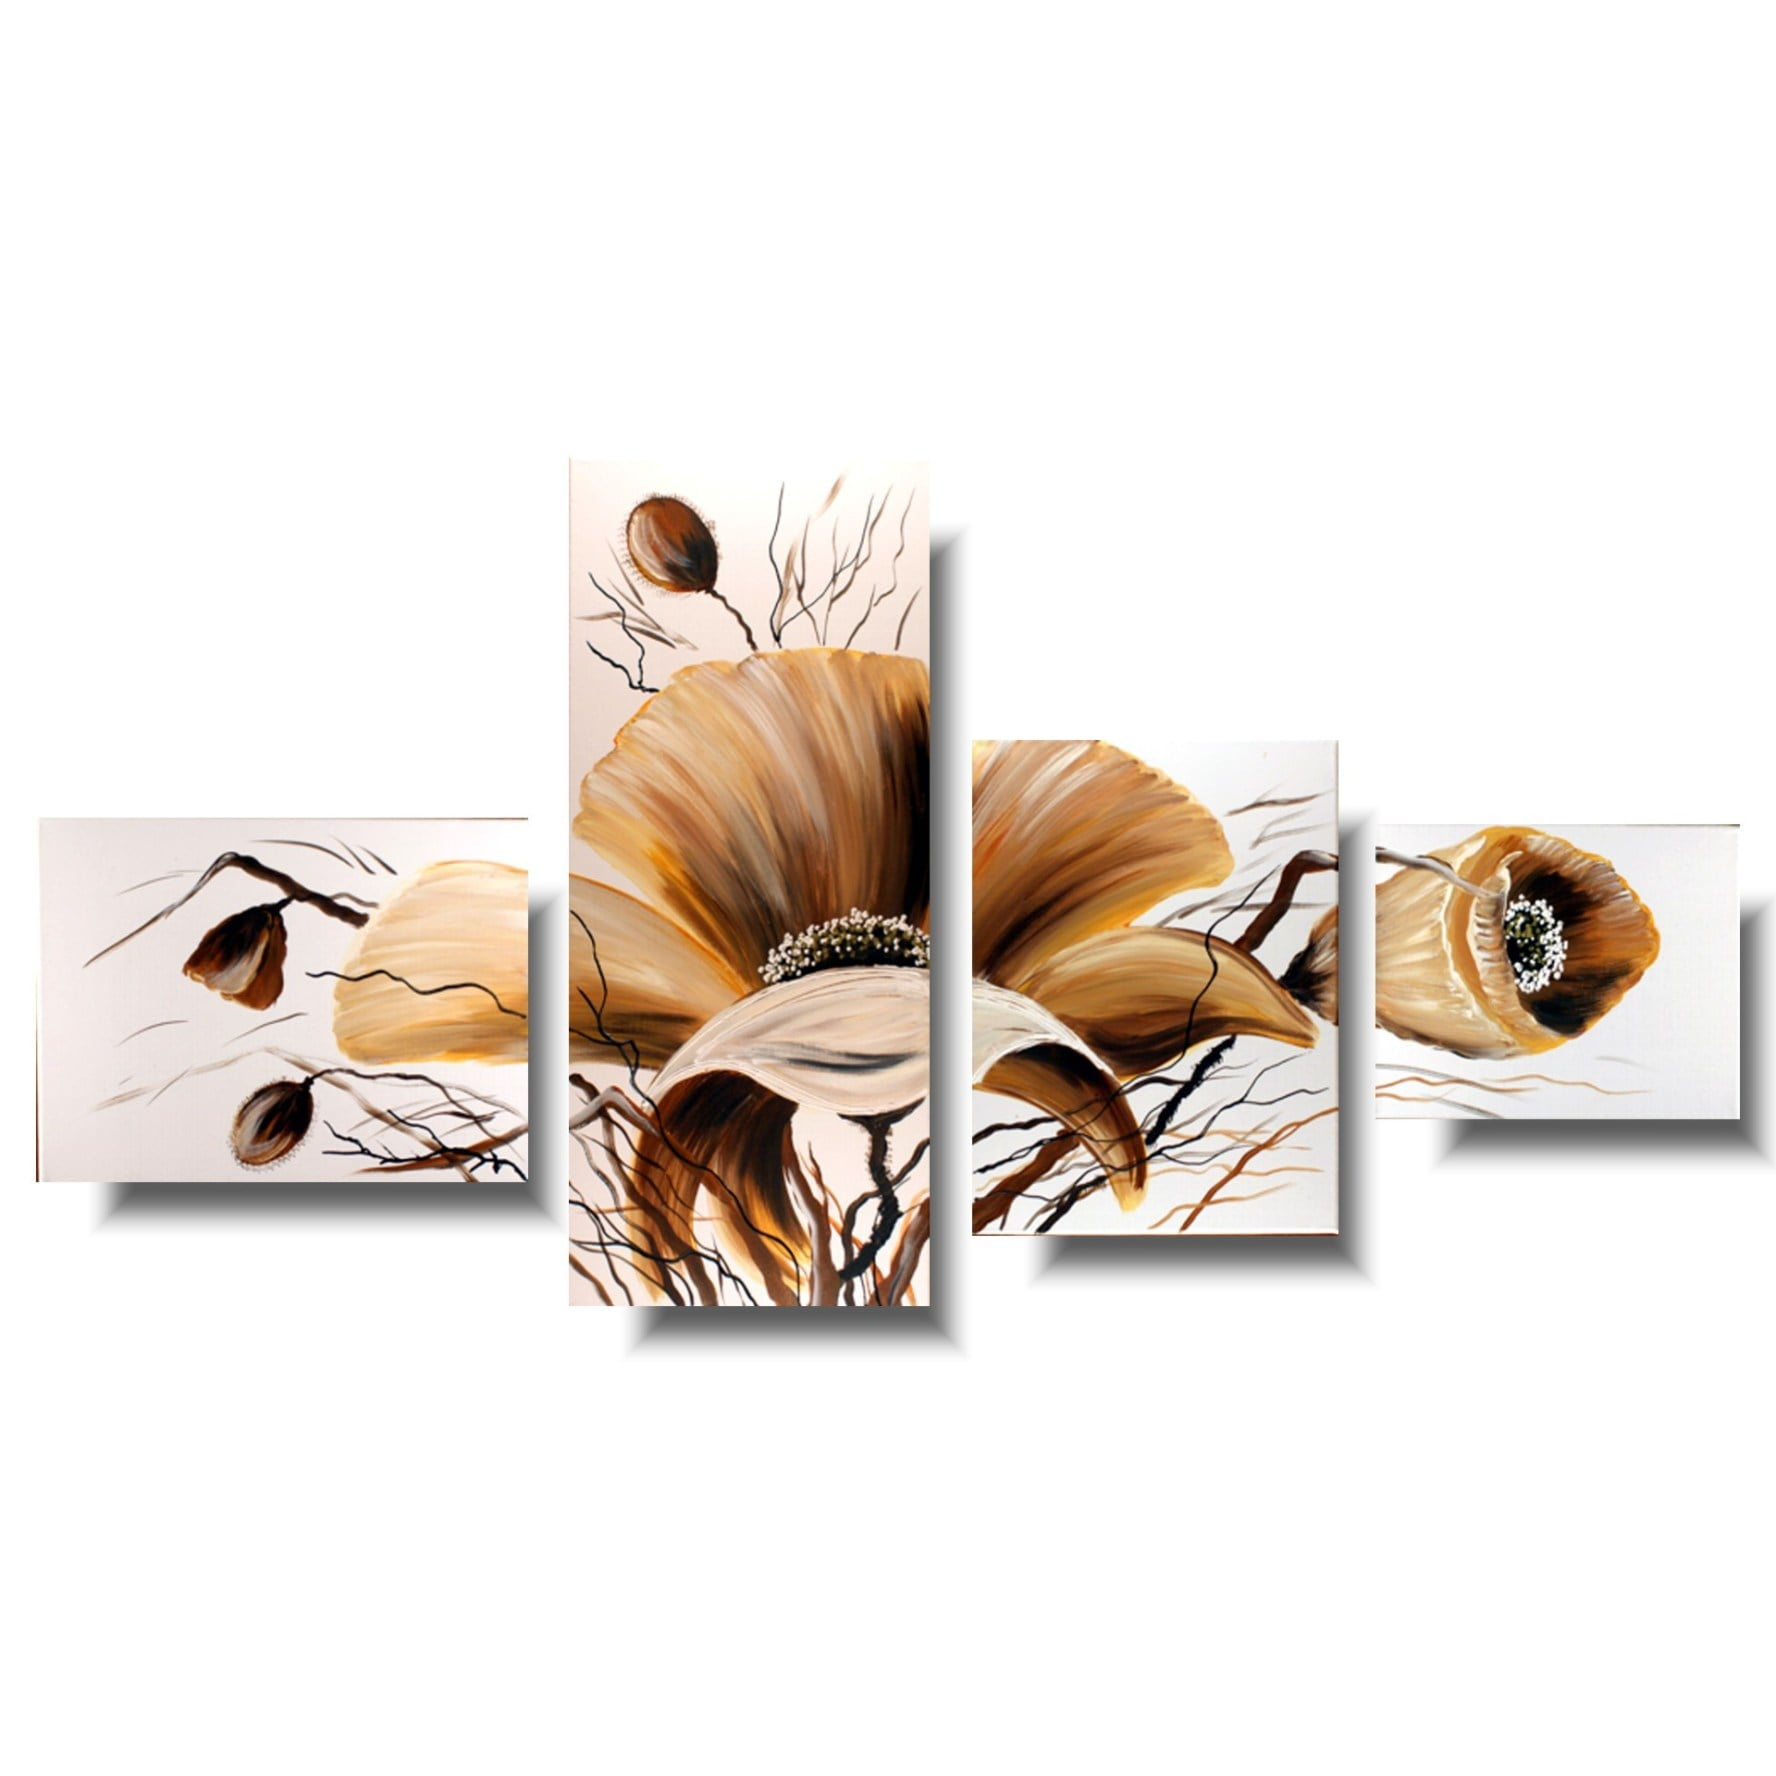 Letni obraz kwiaty maki